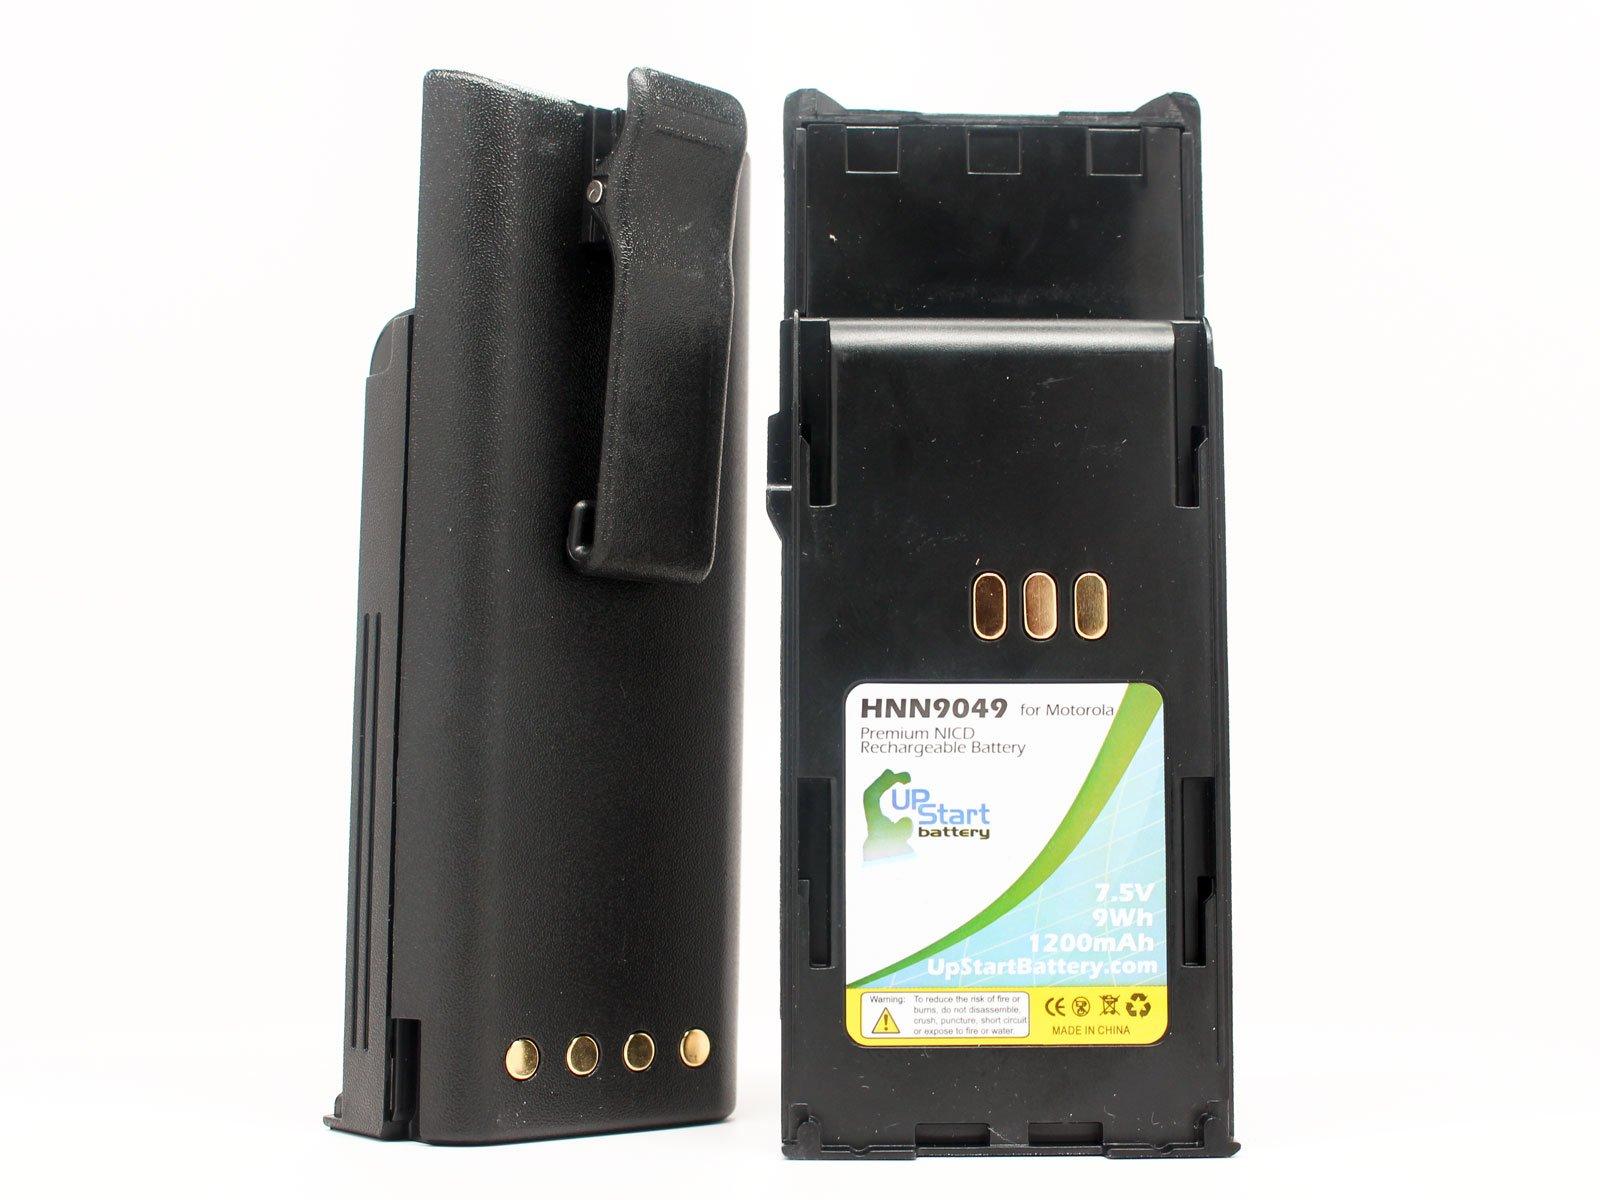 2x Pack - Motorola HNN9049 Two-Way Radio Battery Replacement (1200mAh, 7.5V, NI-CD) - Compatible with Motorola P1225 Battery, HNN9049, HNN9049A, HNN9049AR, HNN9049B, HNN9049H, HNN9050, HNN9050A, HNN9051, HNN9051A, P1225, P1225 LS